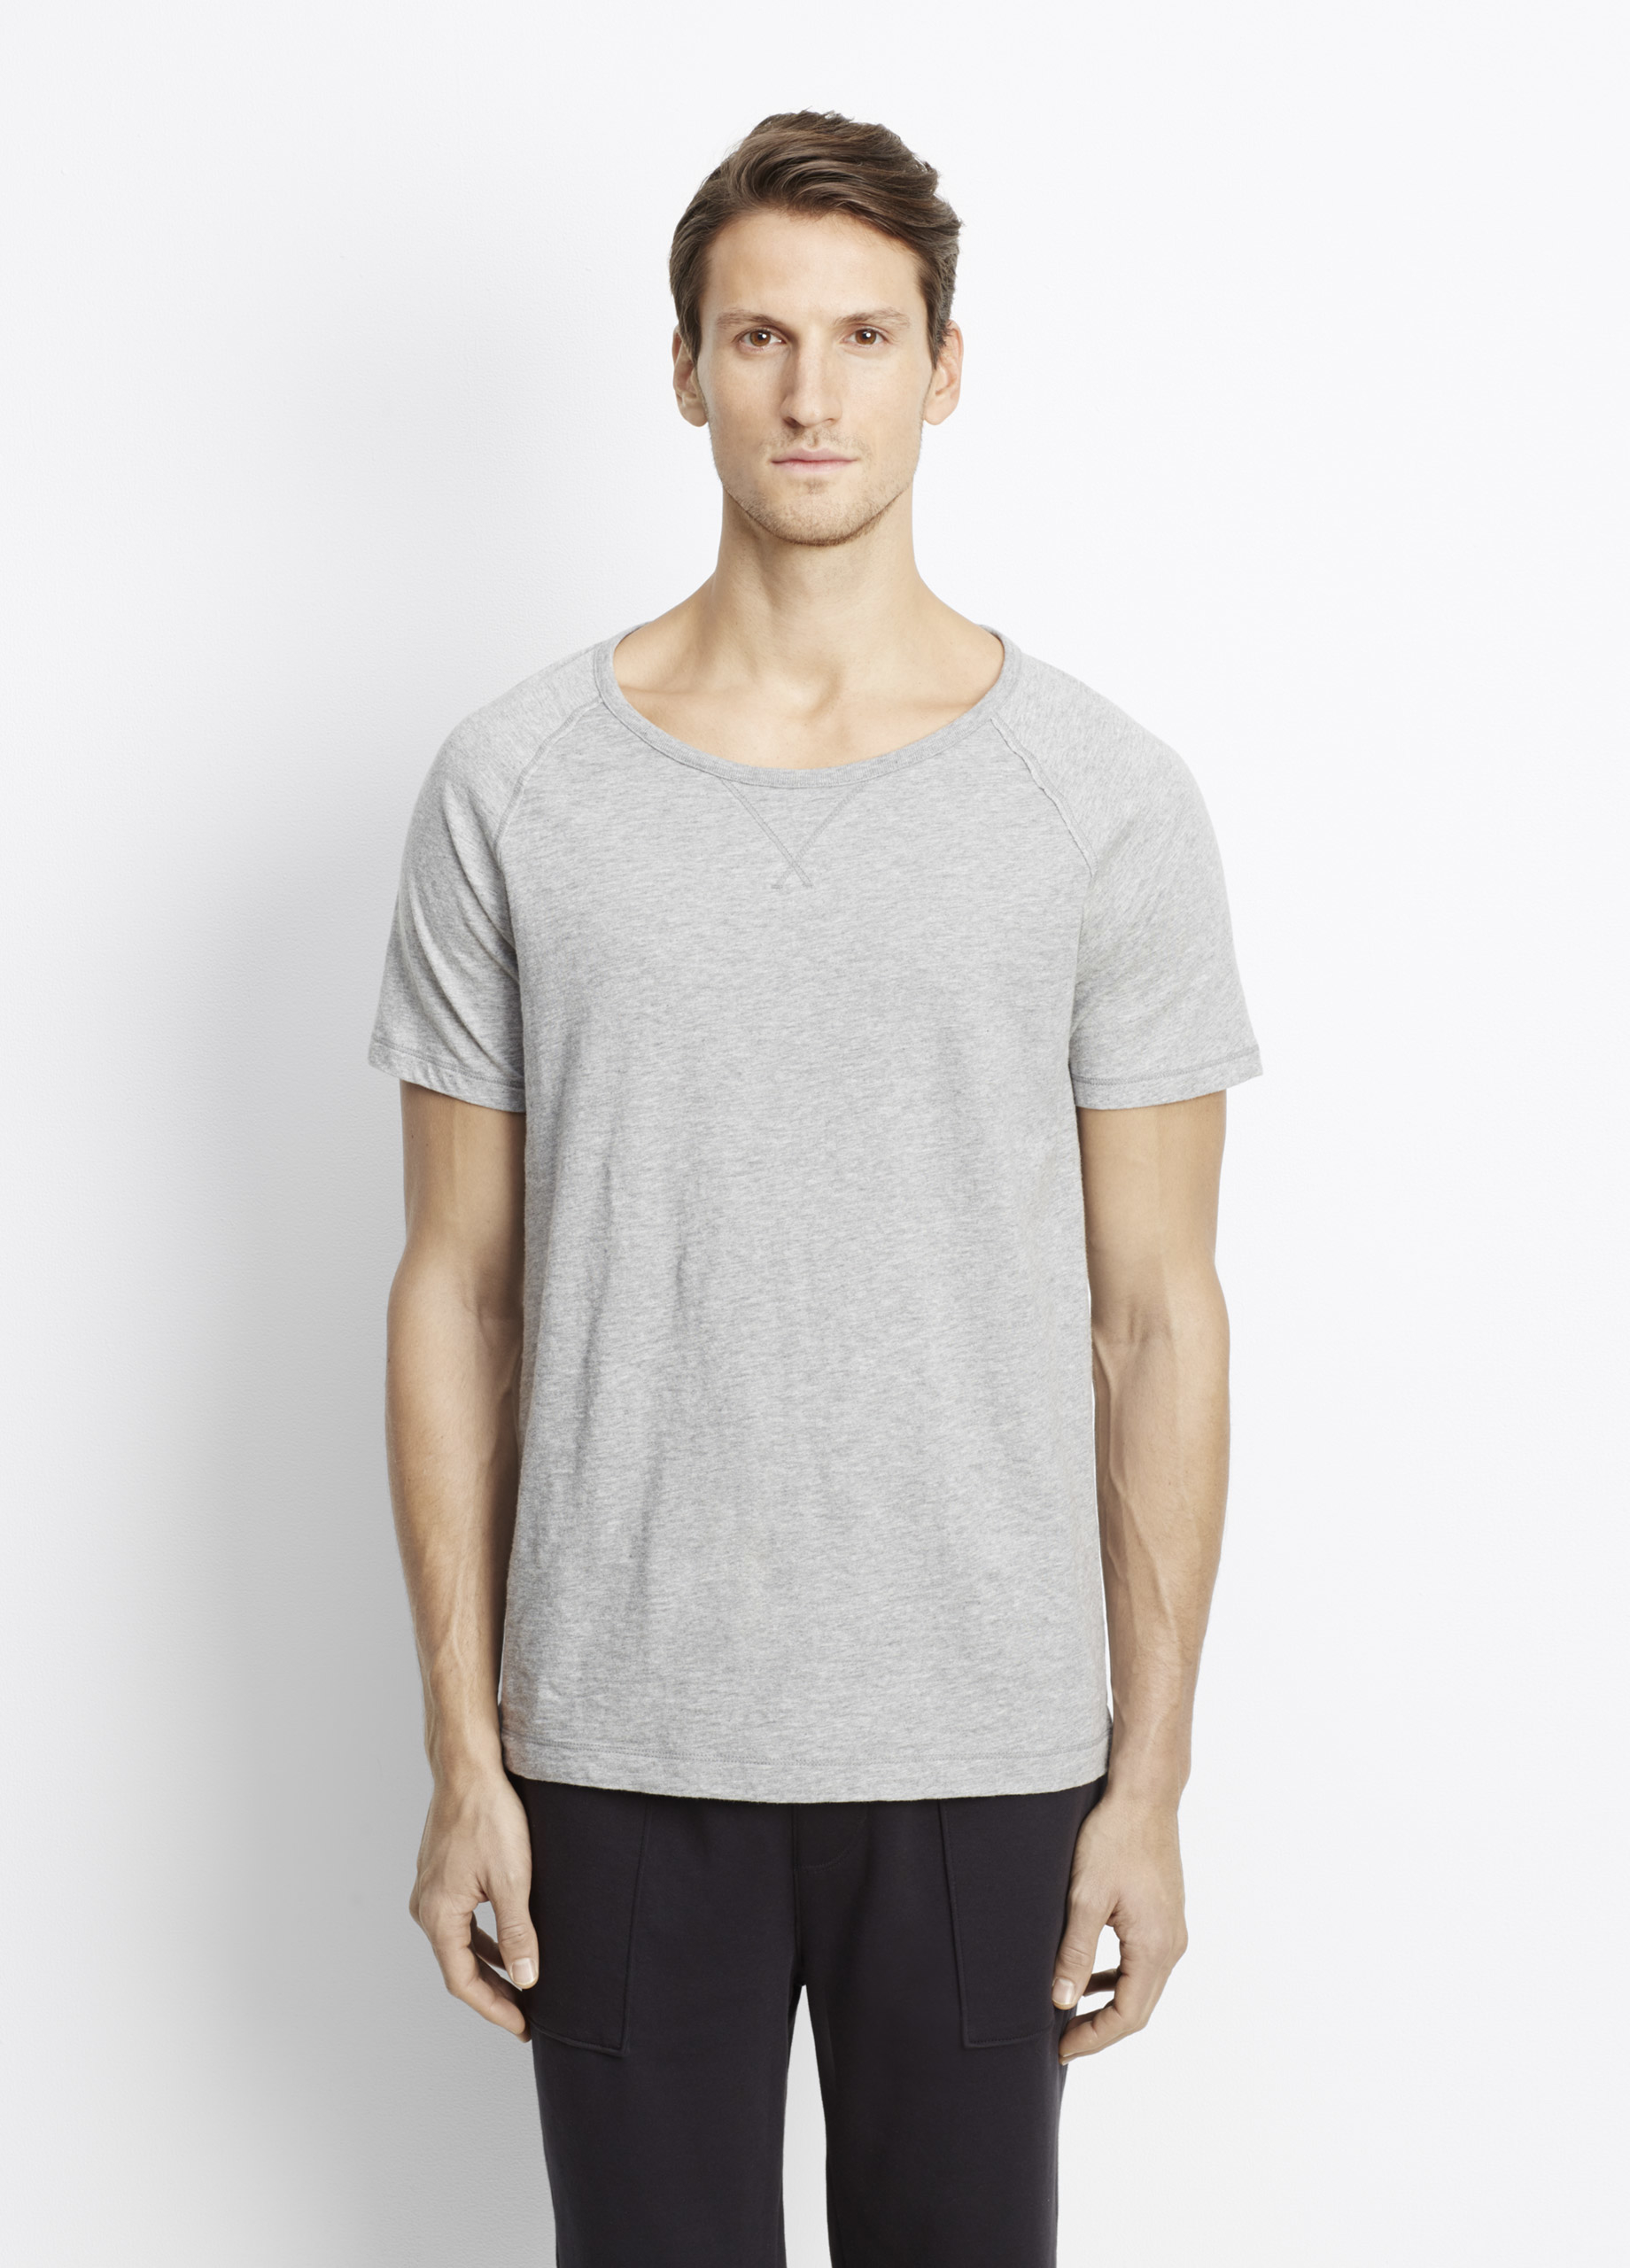 Vince slub cotton short sleeve raglan tee in gray for men for Vince tee shirts sale